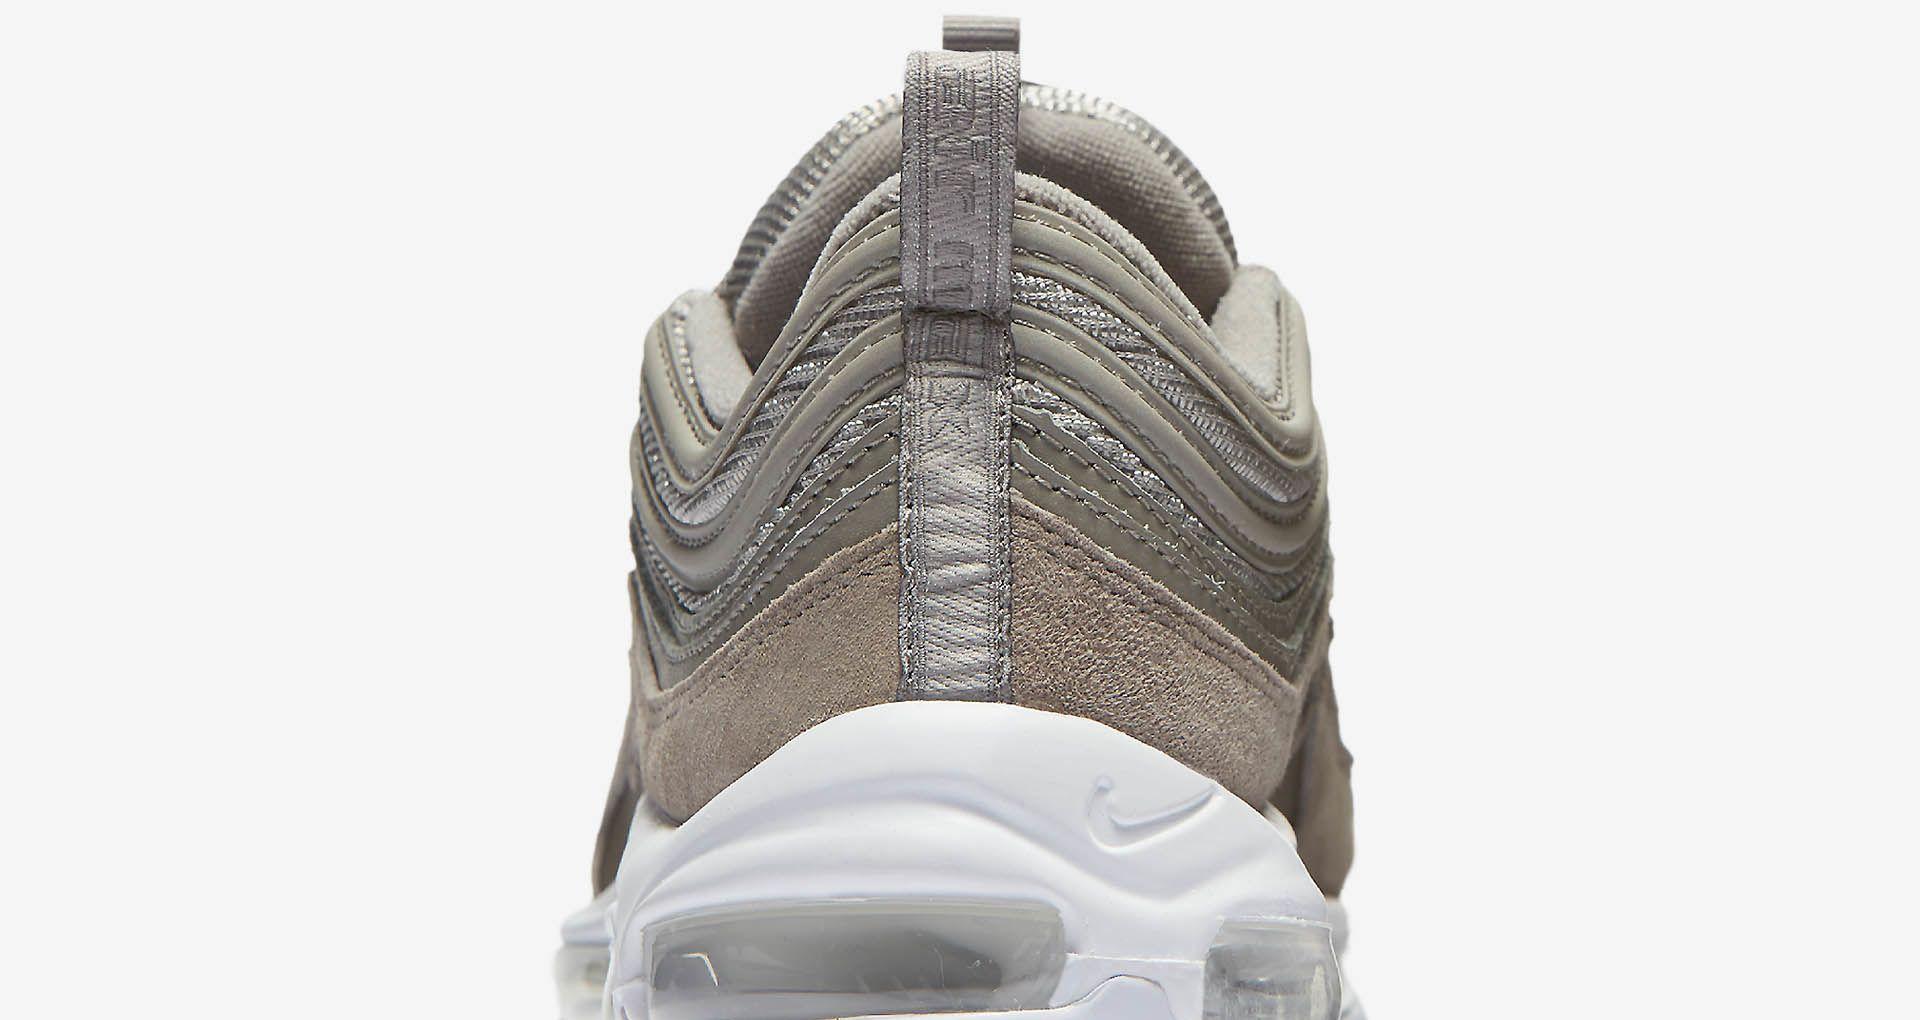 Nike Air Max 97 'Cobblestone' Release Date. Nike+ Launch NL